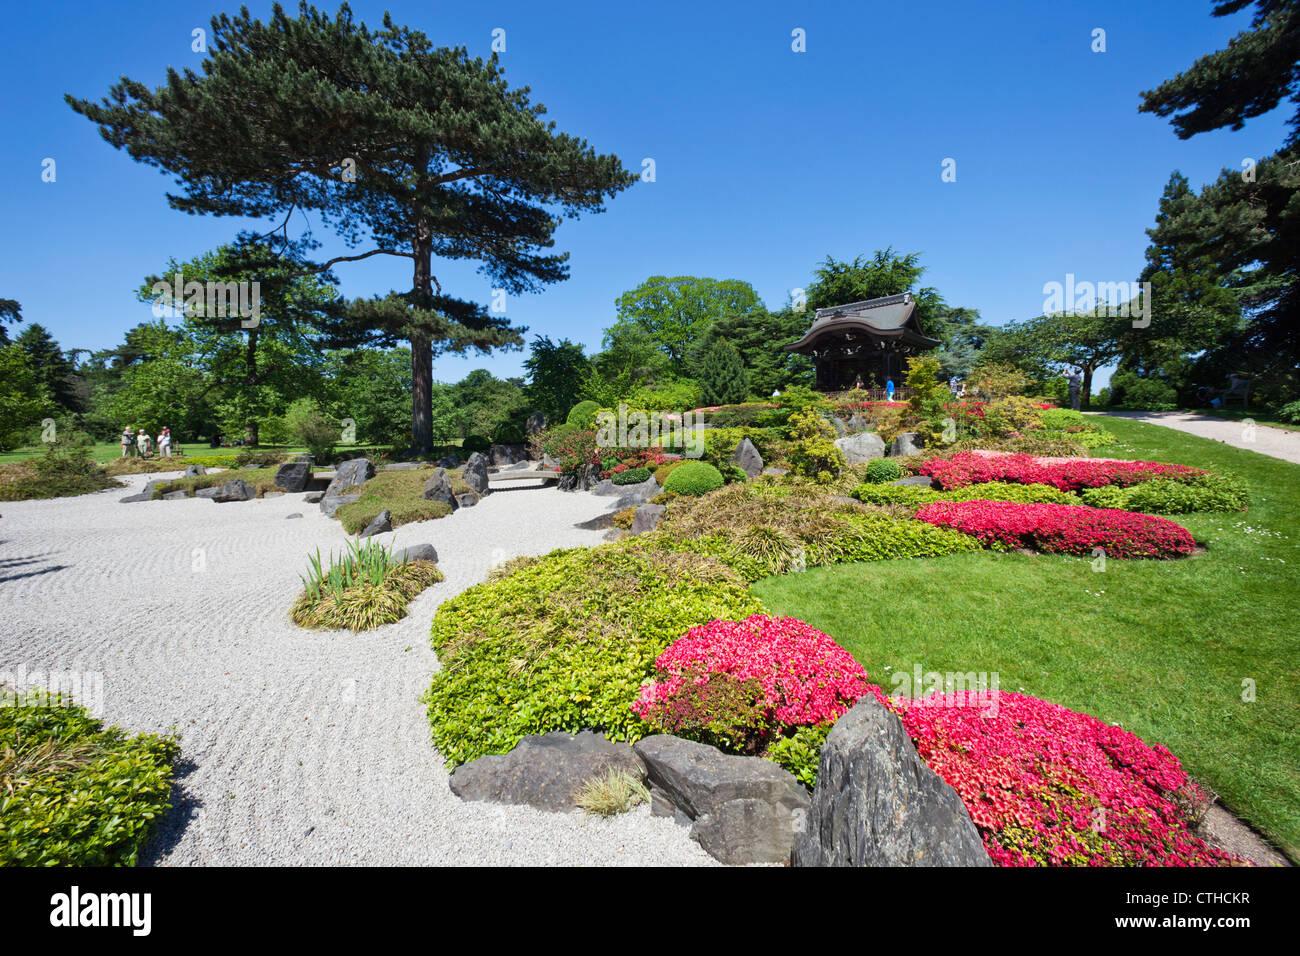 England, London, Richmond, Kew Gardens, Japanese Gateway